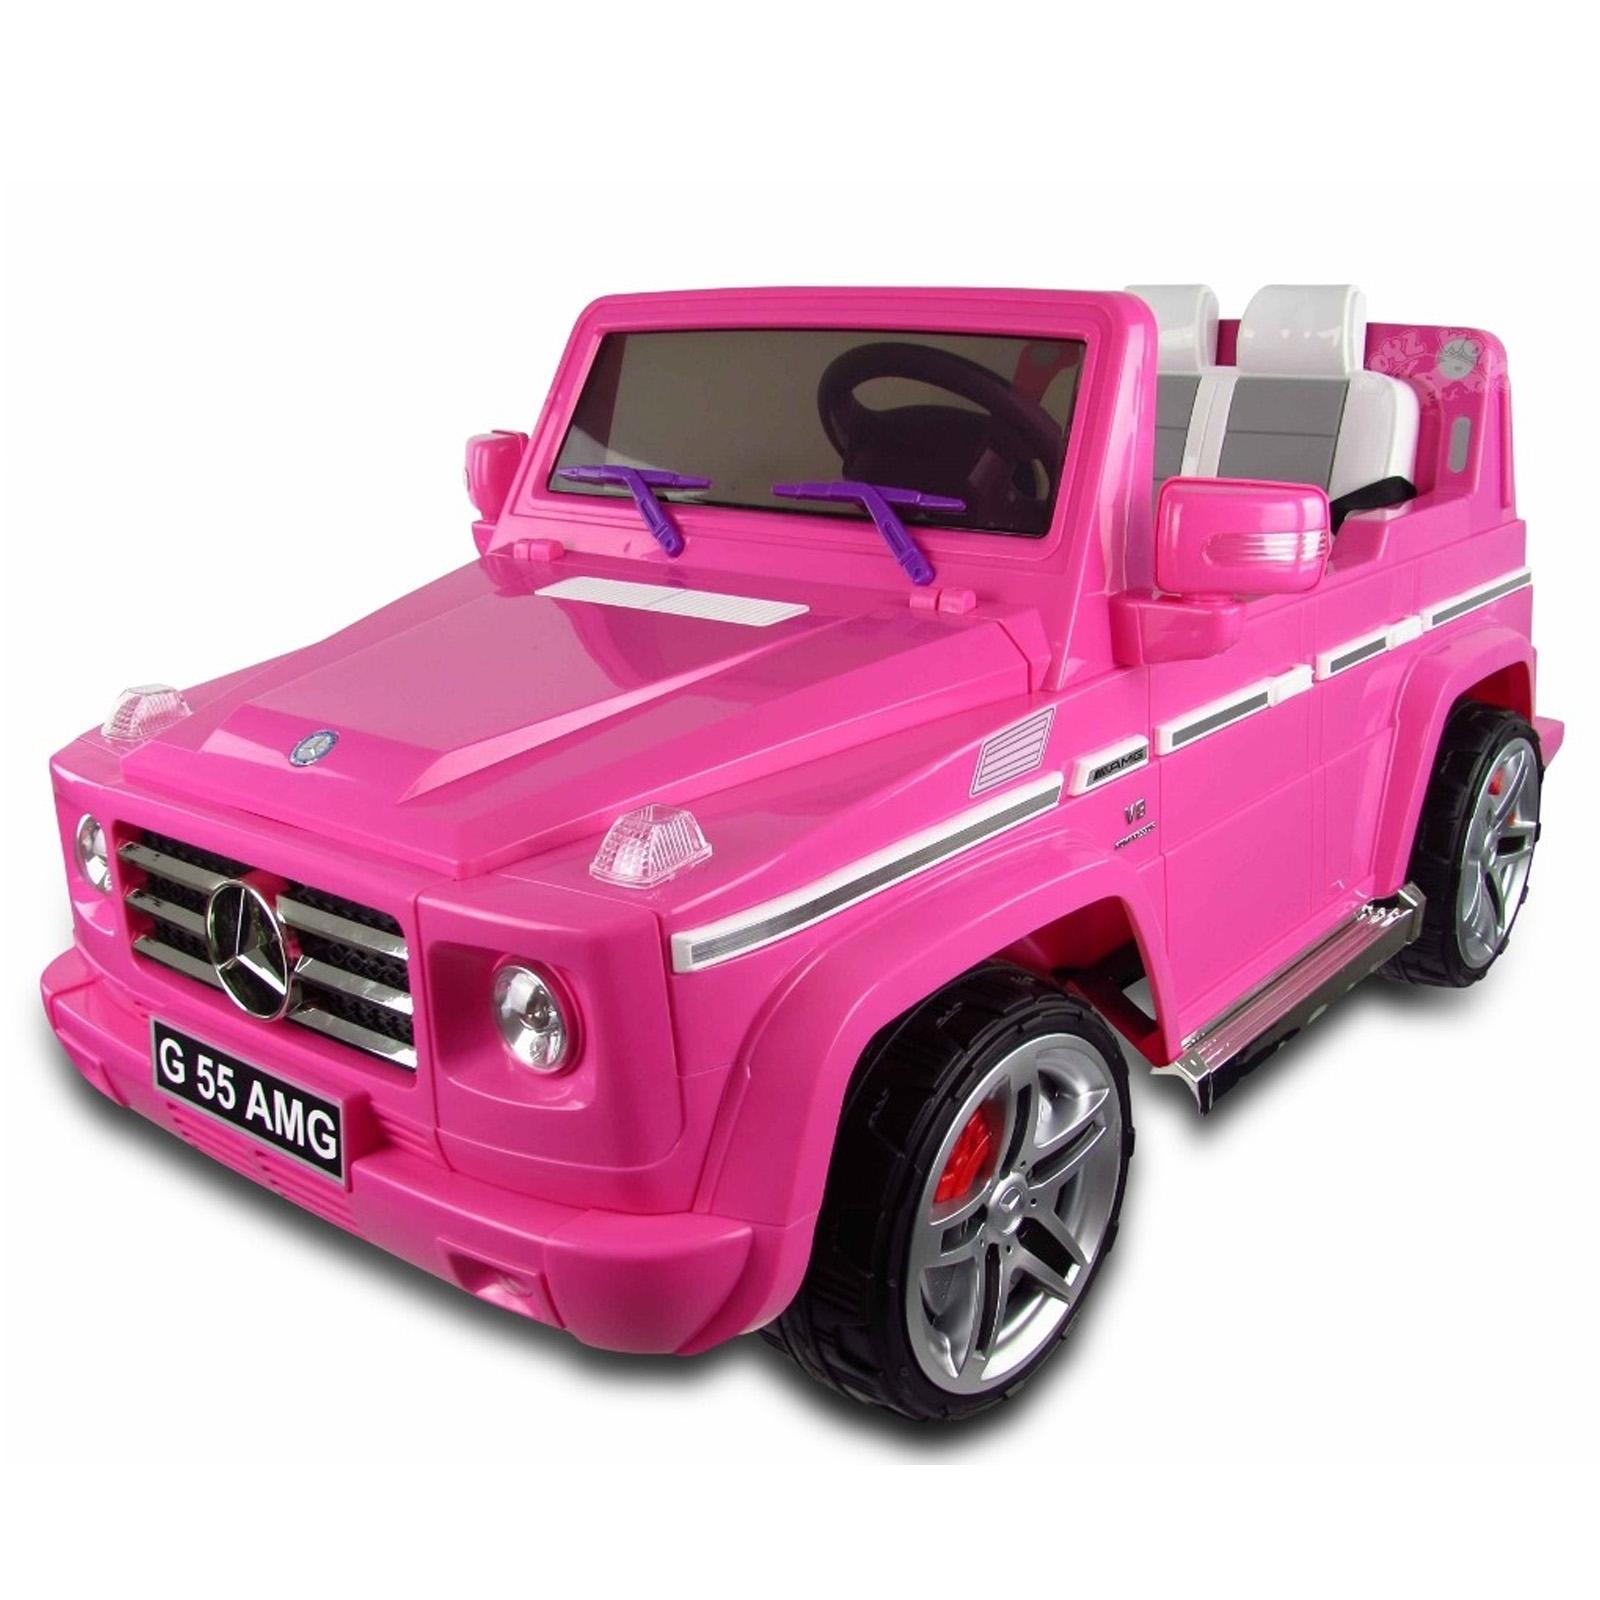 mercedes benz g55 12v battery power ride on car for kids pink